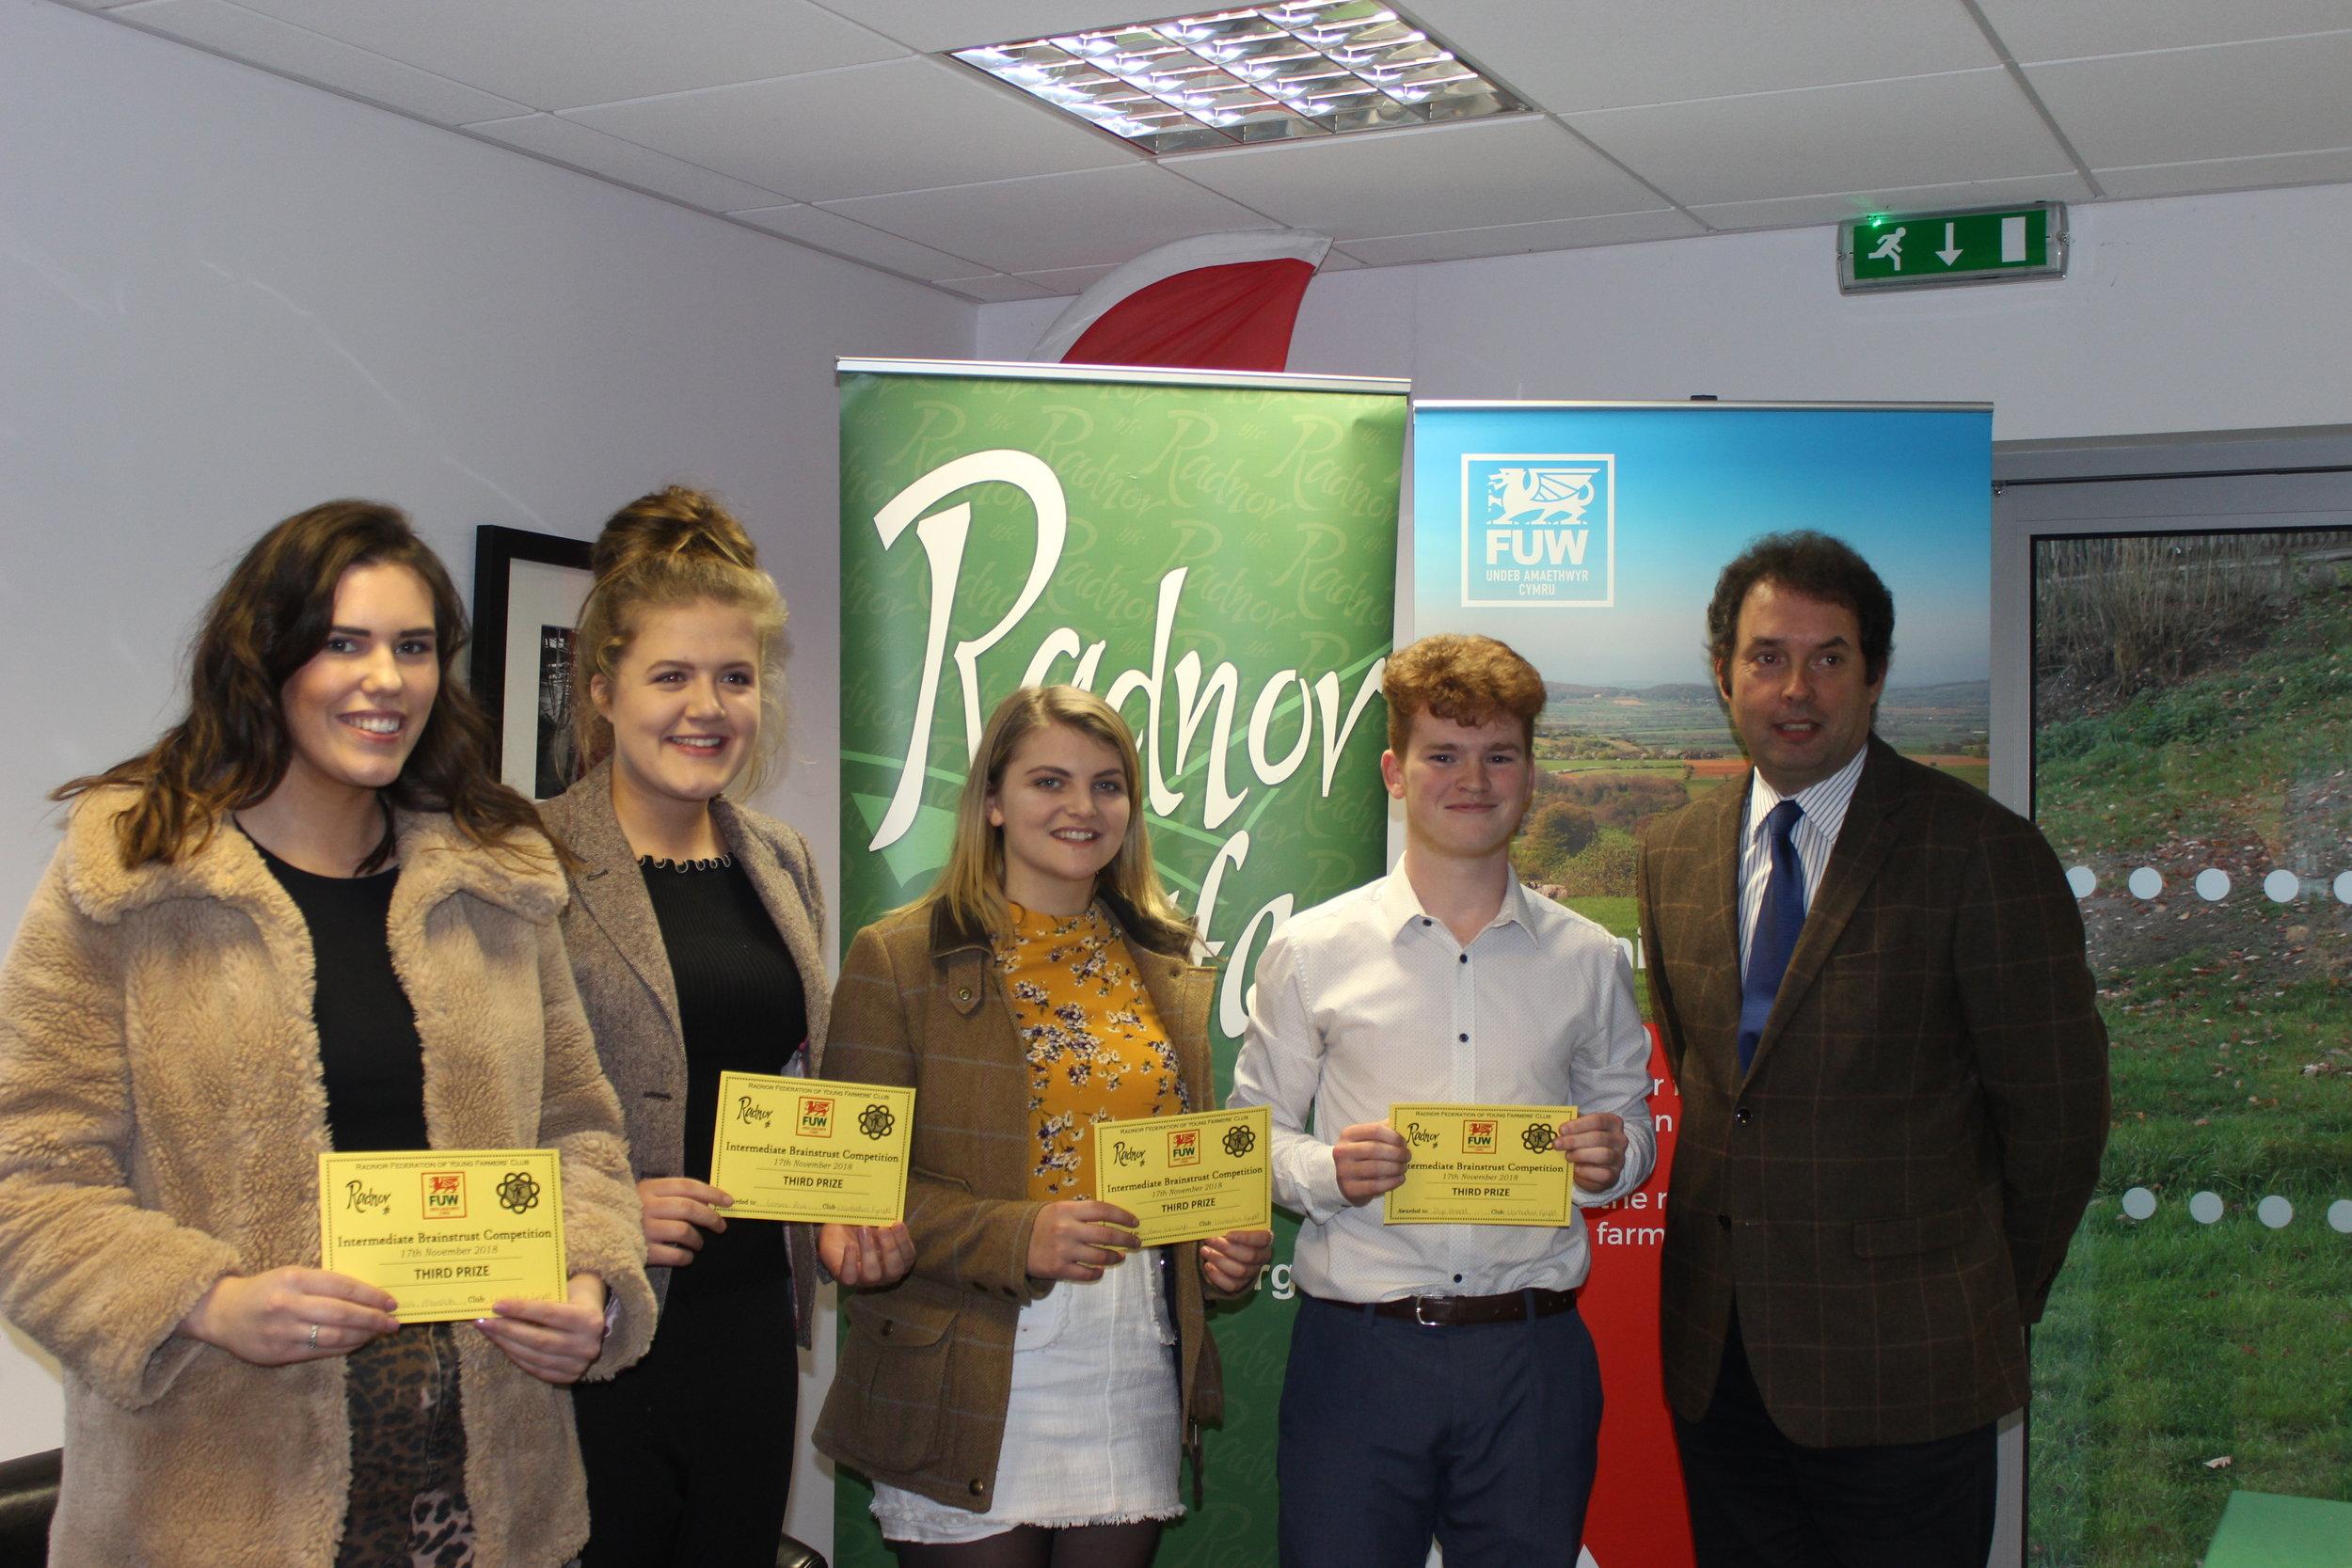 Sarah Meredith, Gemma Price, Annie Fairclough & Rhys Bennett, Llanbadarn Fynydd YFC coming 3rd place in the Intermediate Brainstrust with judge Alan Gardner.